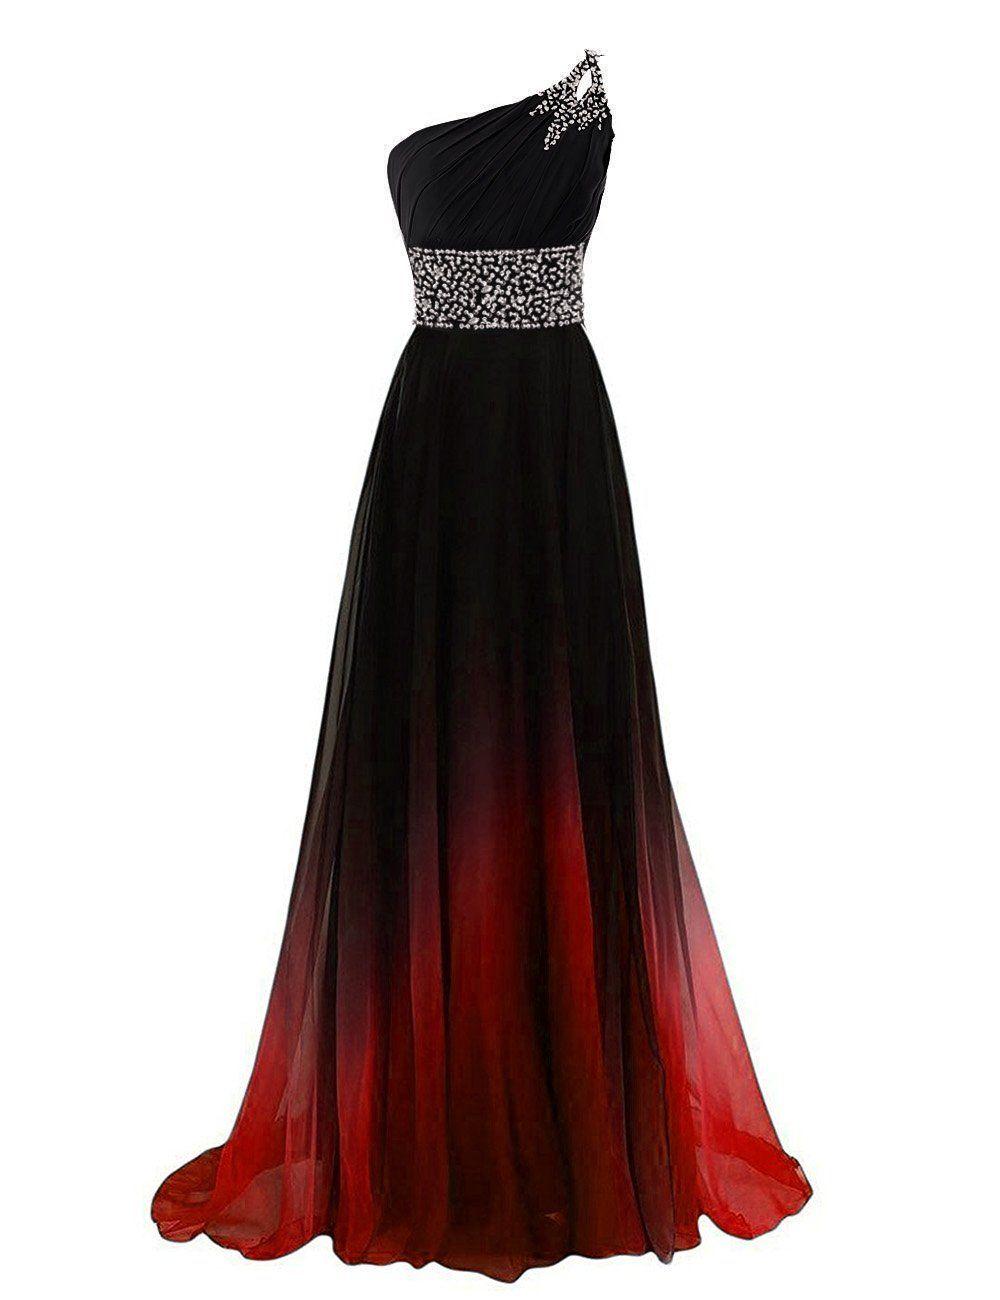 0879c3236c60 Beaded Party Dresses Uk - PostParc